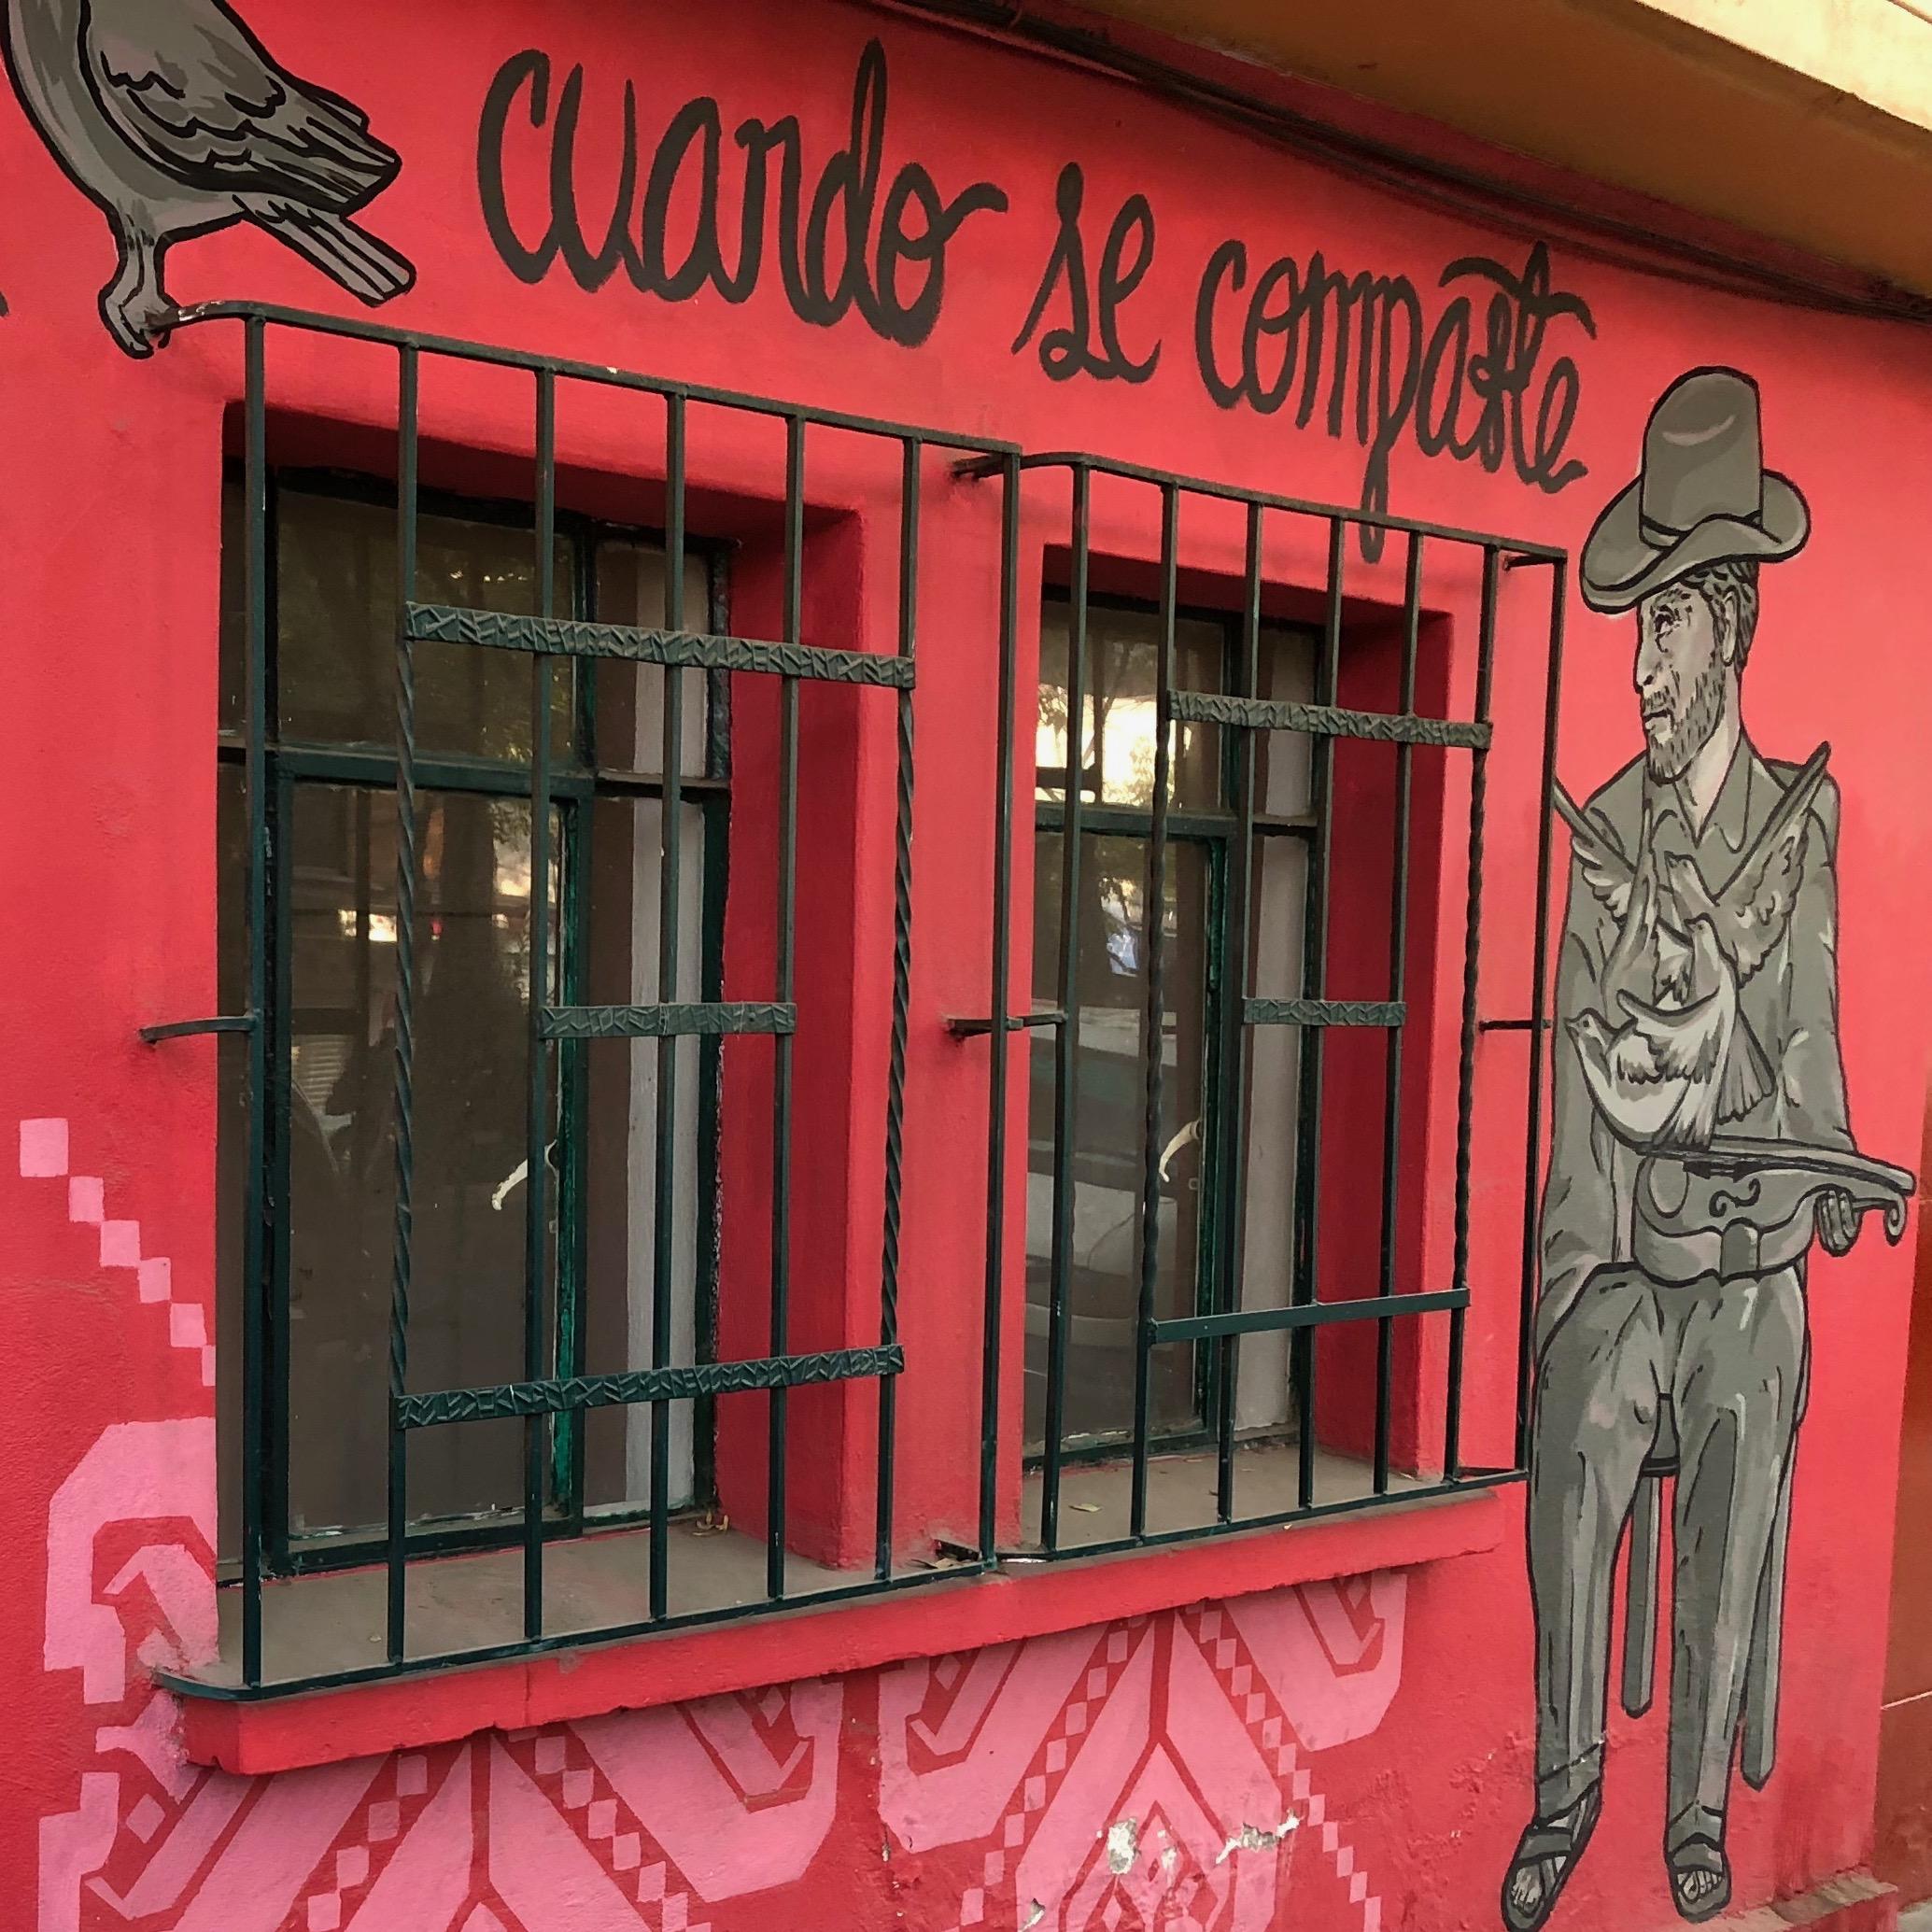 Art urbain Mexico - Roma Norte - Mexico City - Artiste Chauiztle